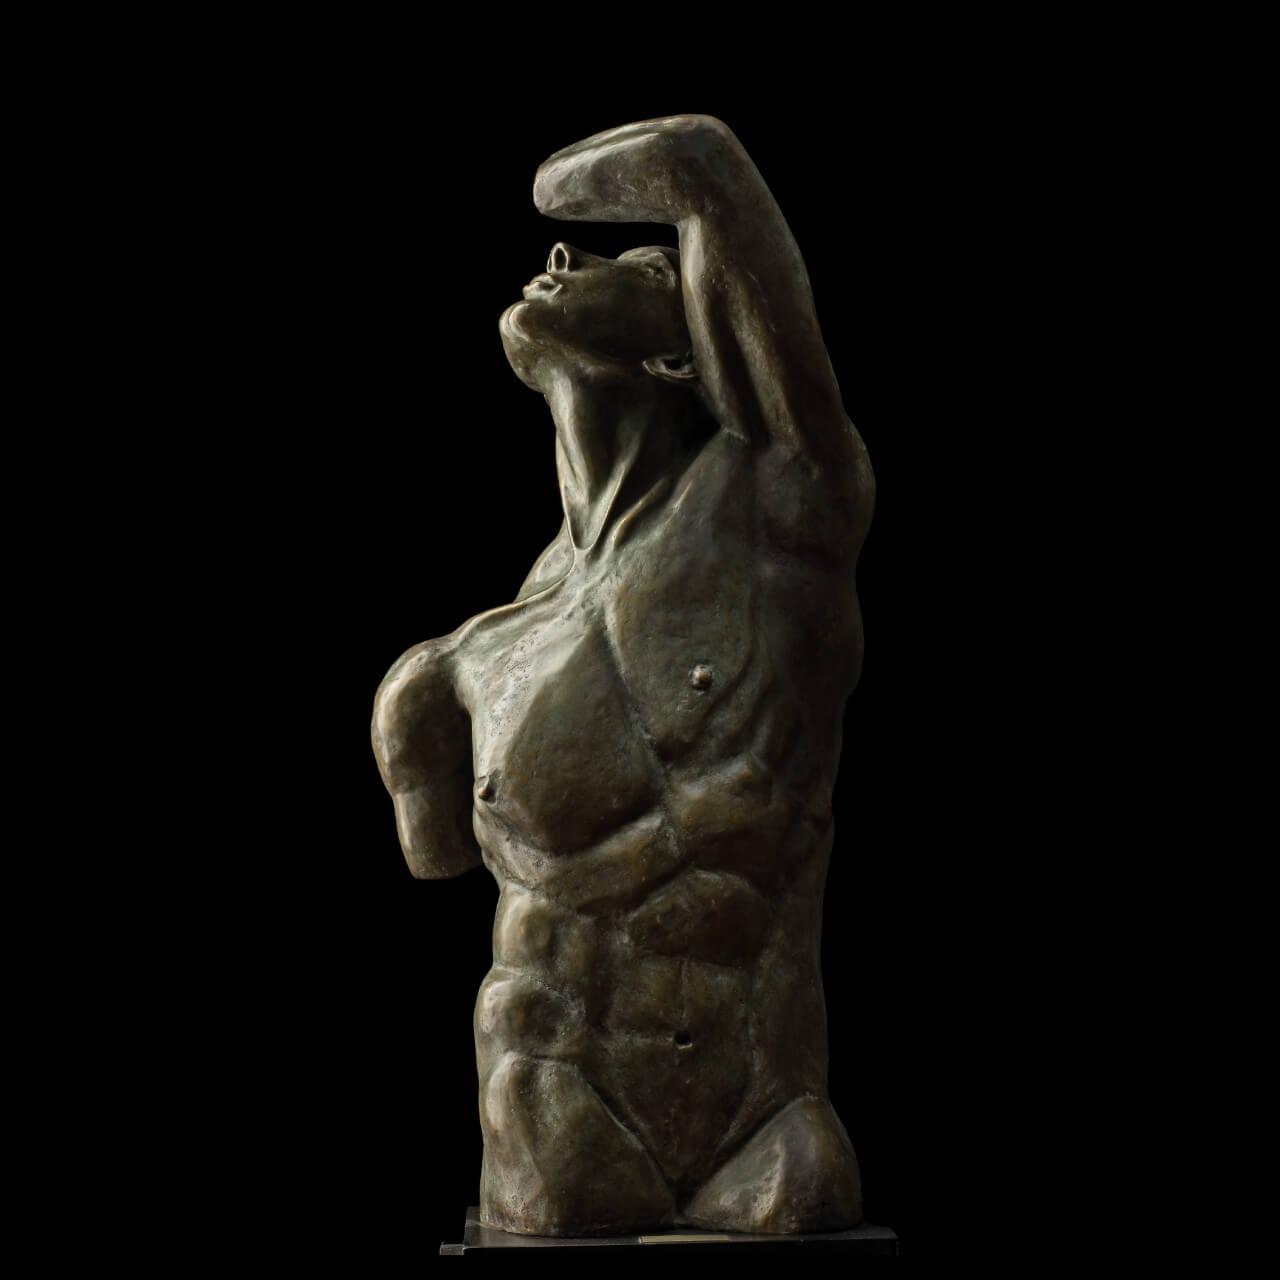 mario pavesi italian sculptur painter bronze male figure Adonai